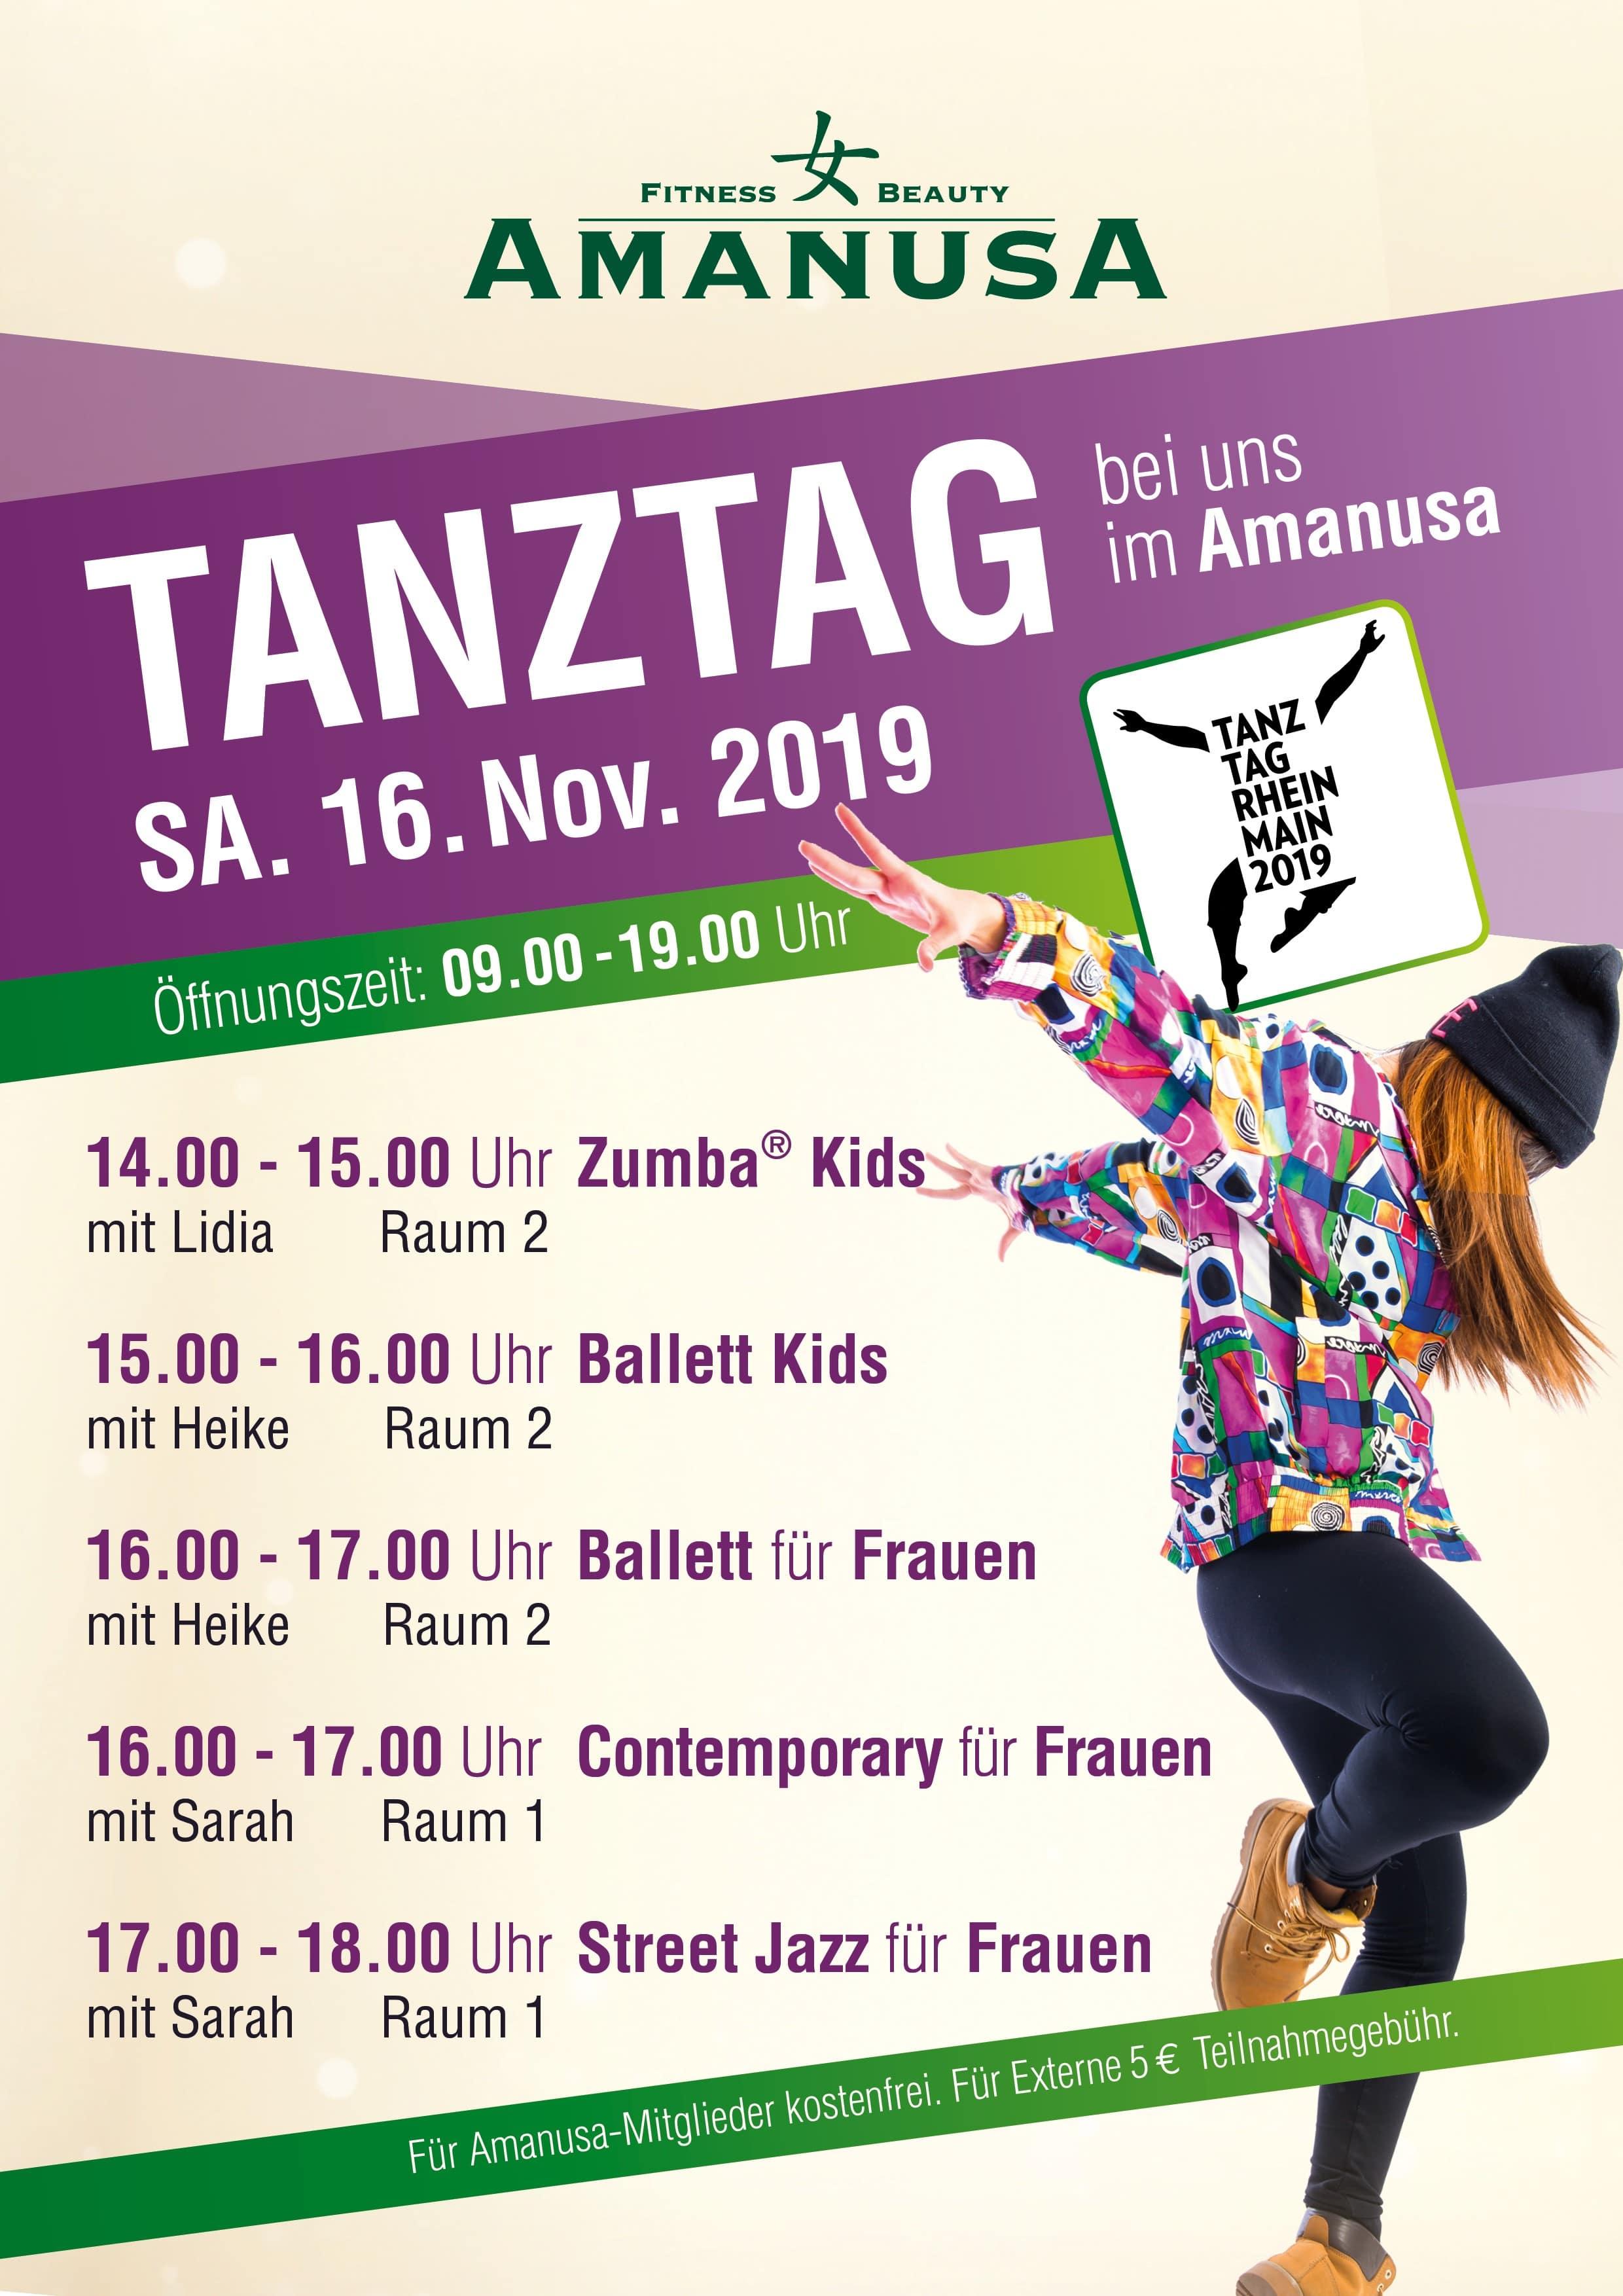 Tanztag 2019 im Amanusa